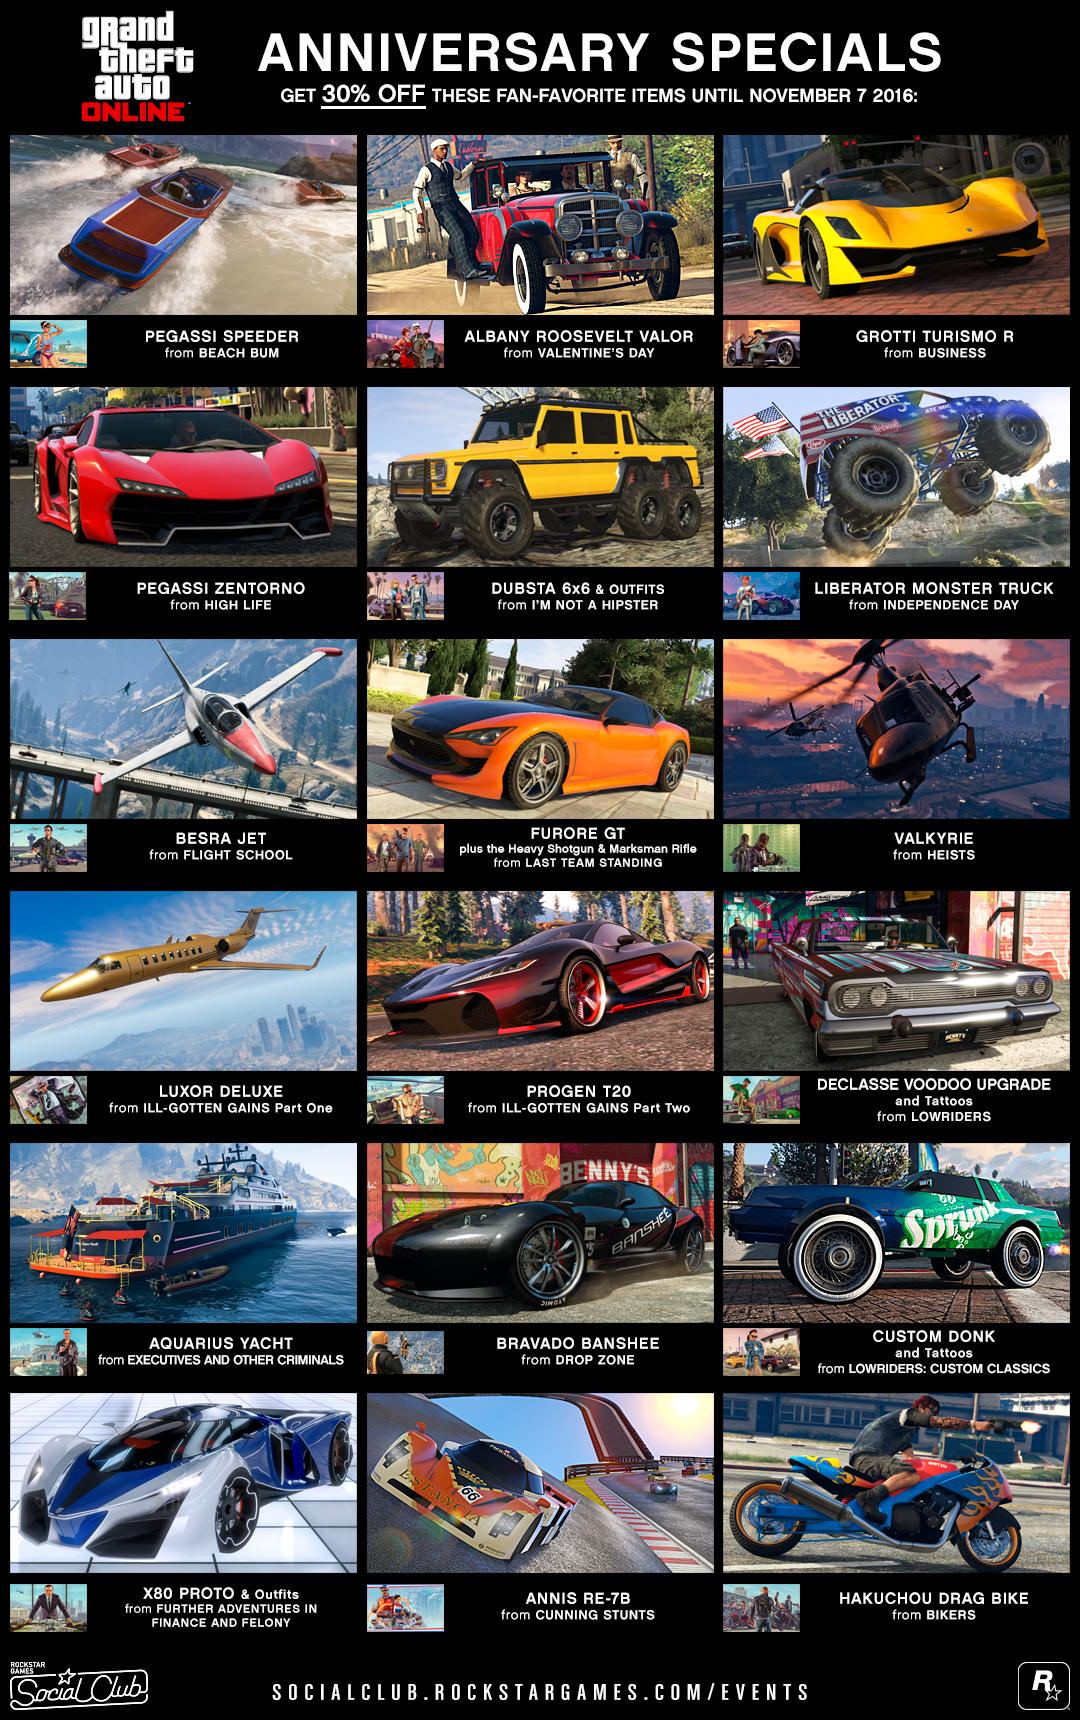 GTA Online Halloween Specials, Anniversary Bonuses, New Vehicles ...